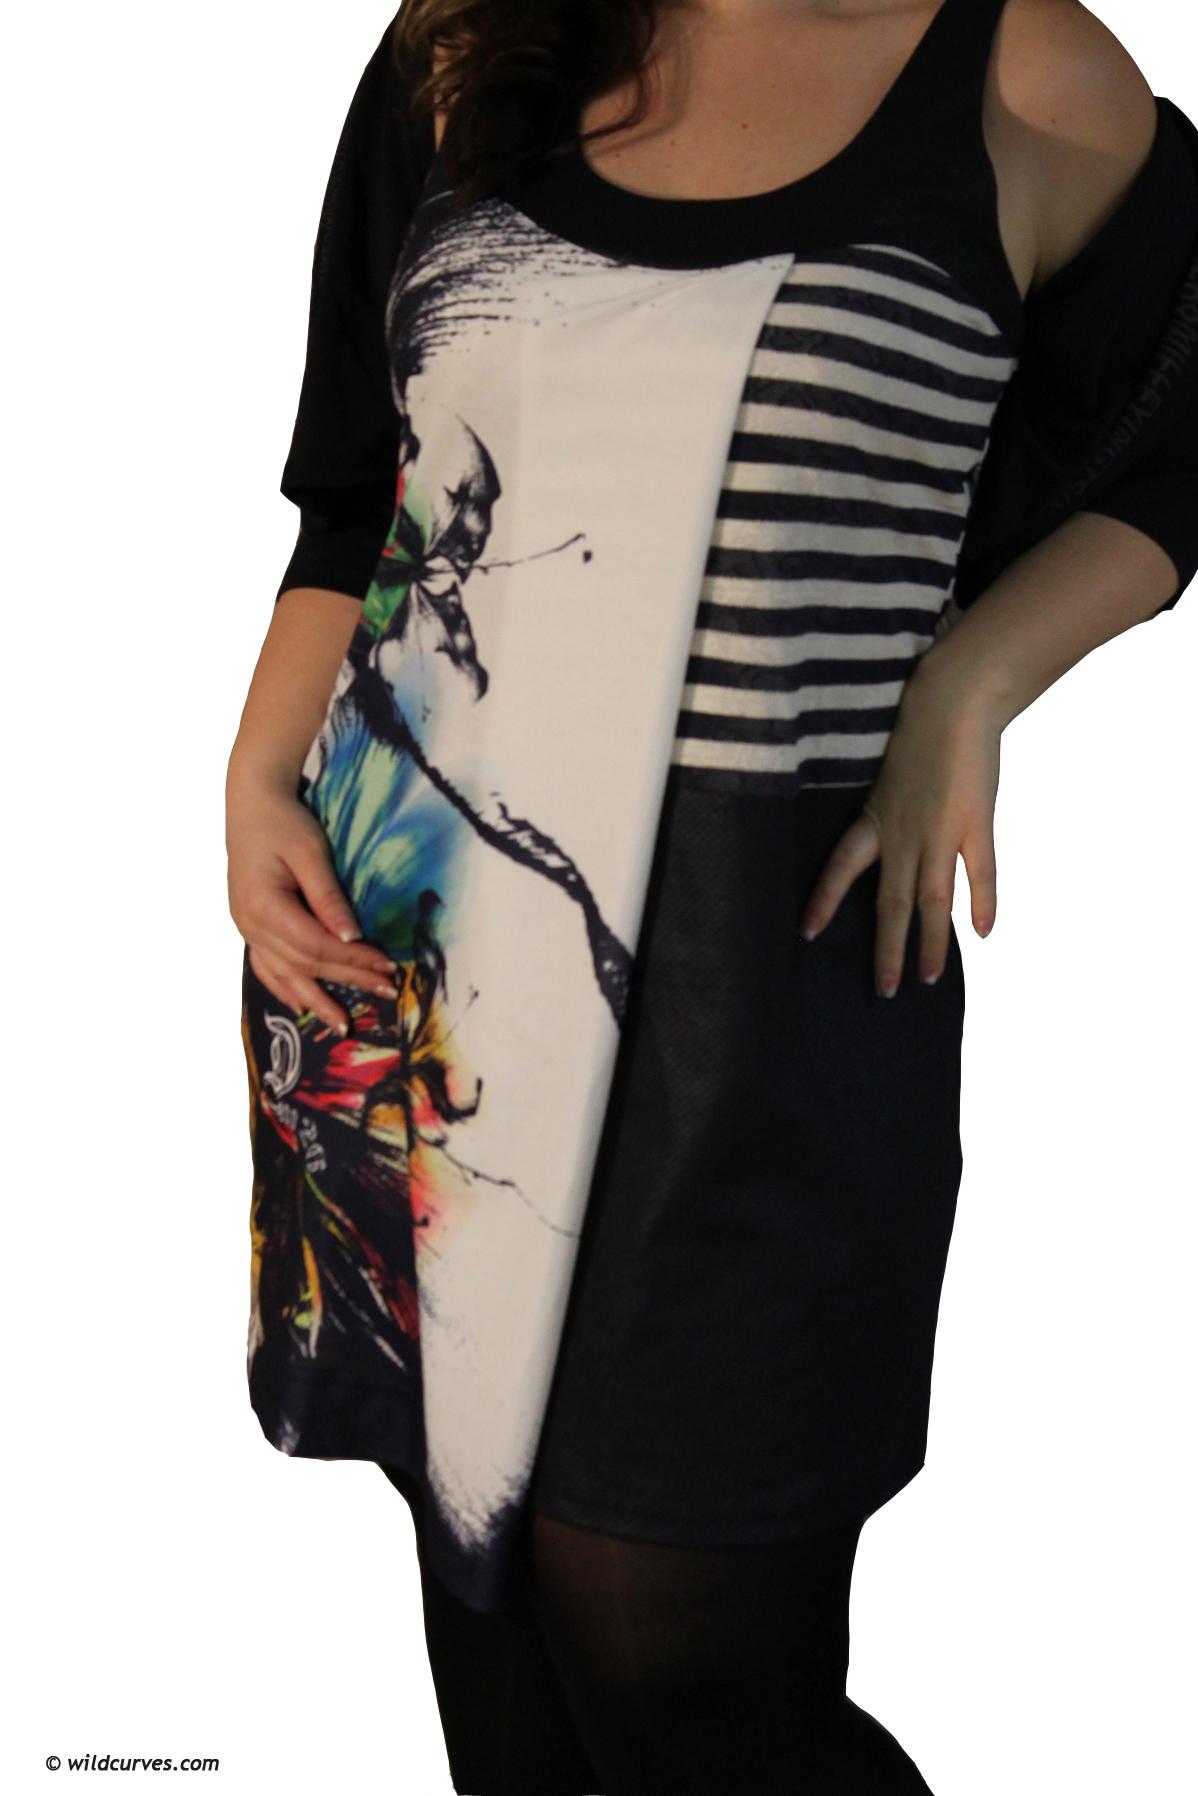 2026 Paris Cross Overlay Color Burst Dress (1 Left!)